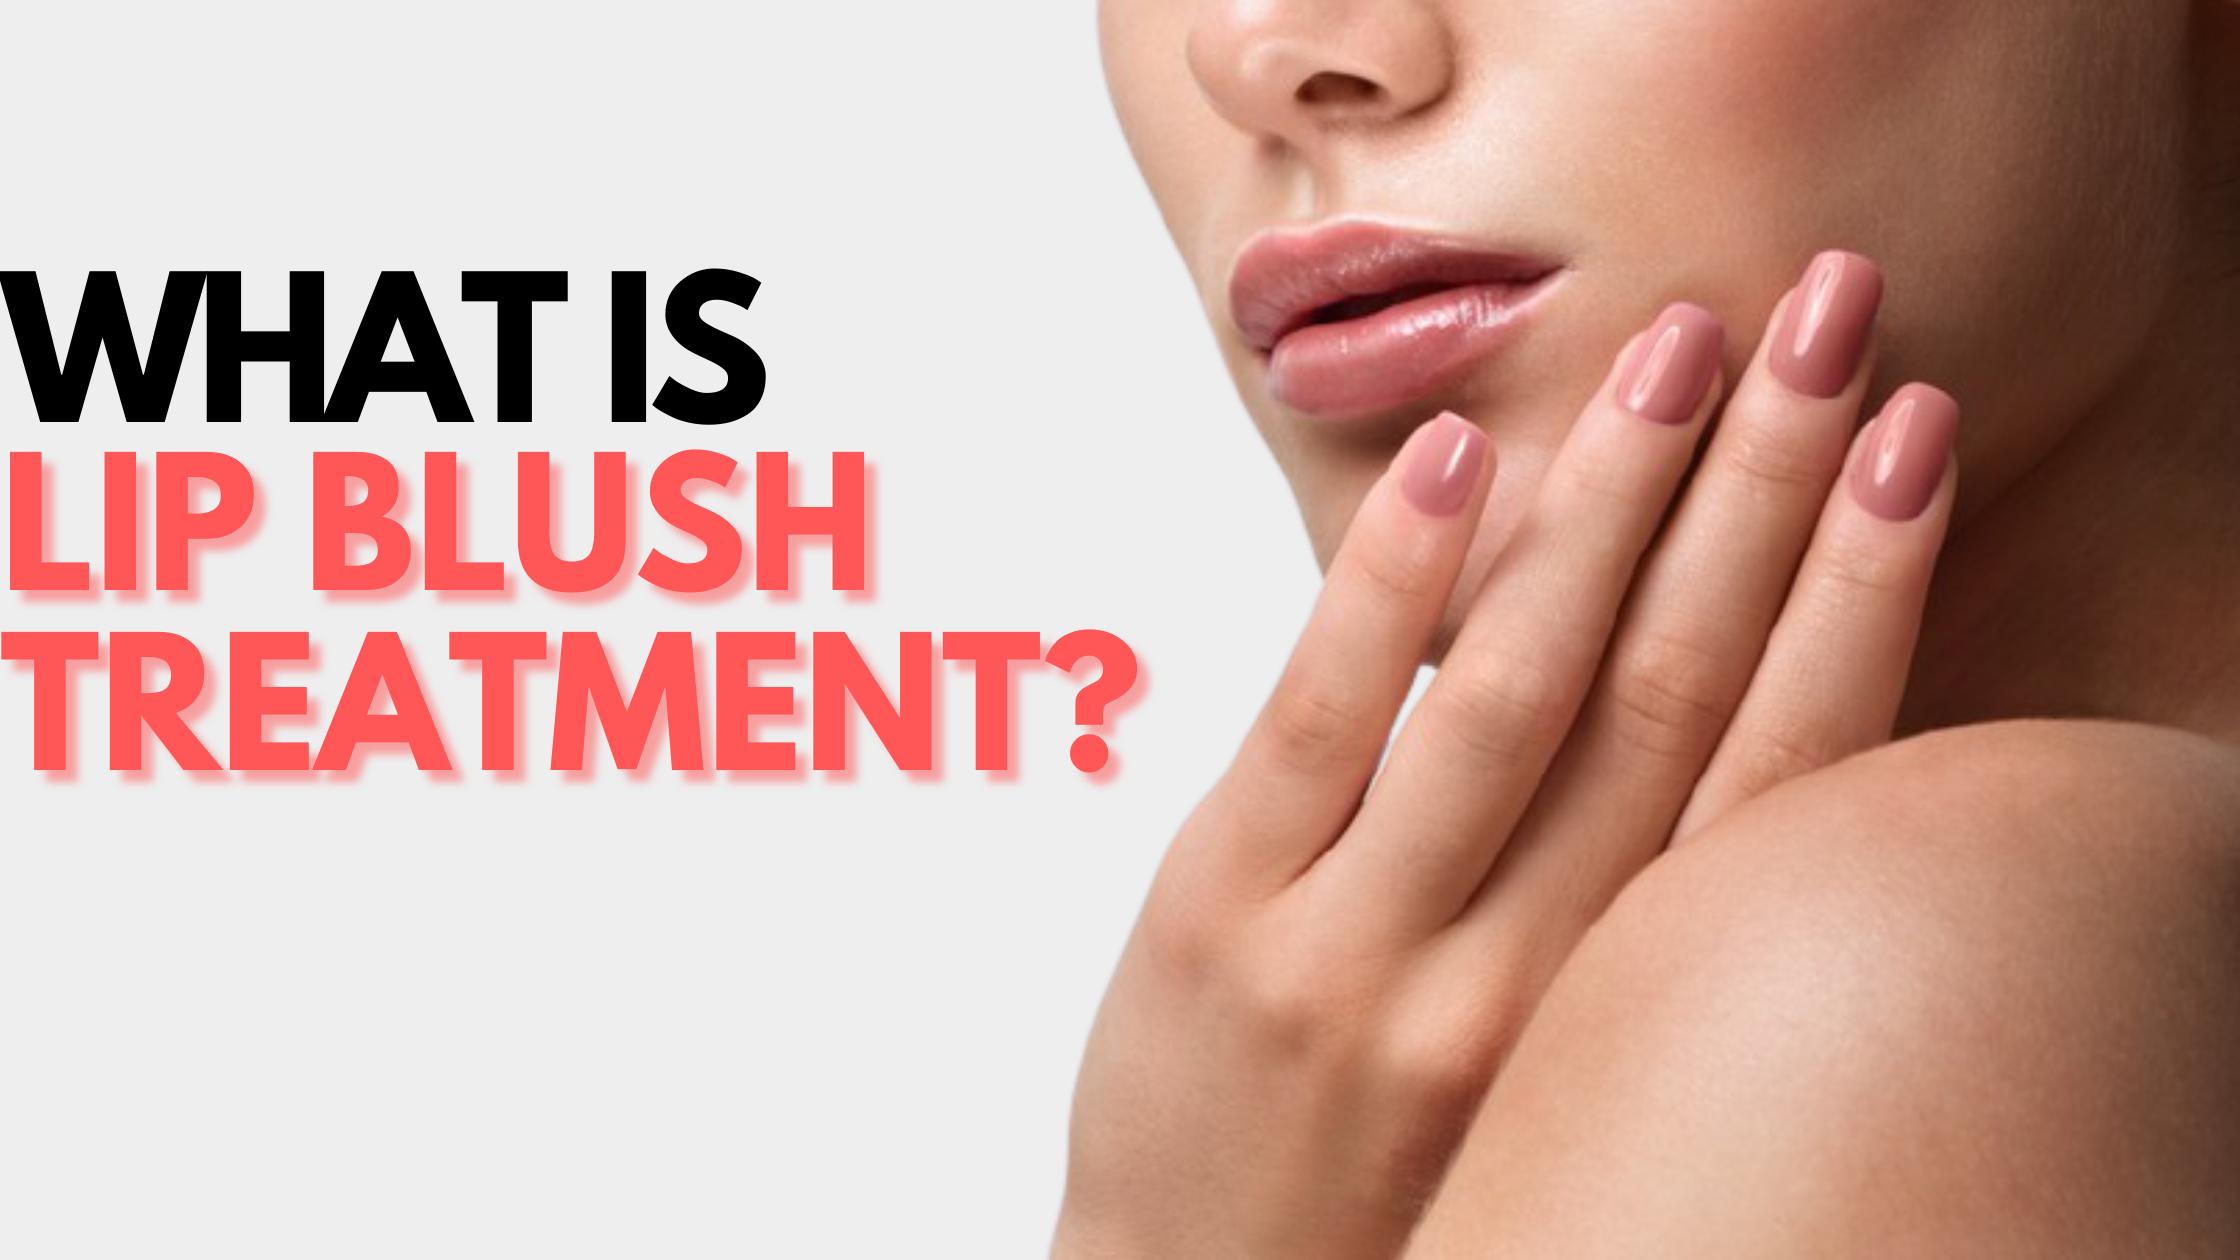 what is lip blush treatment?